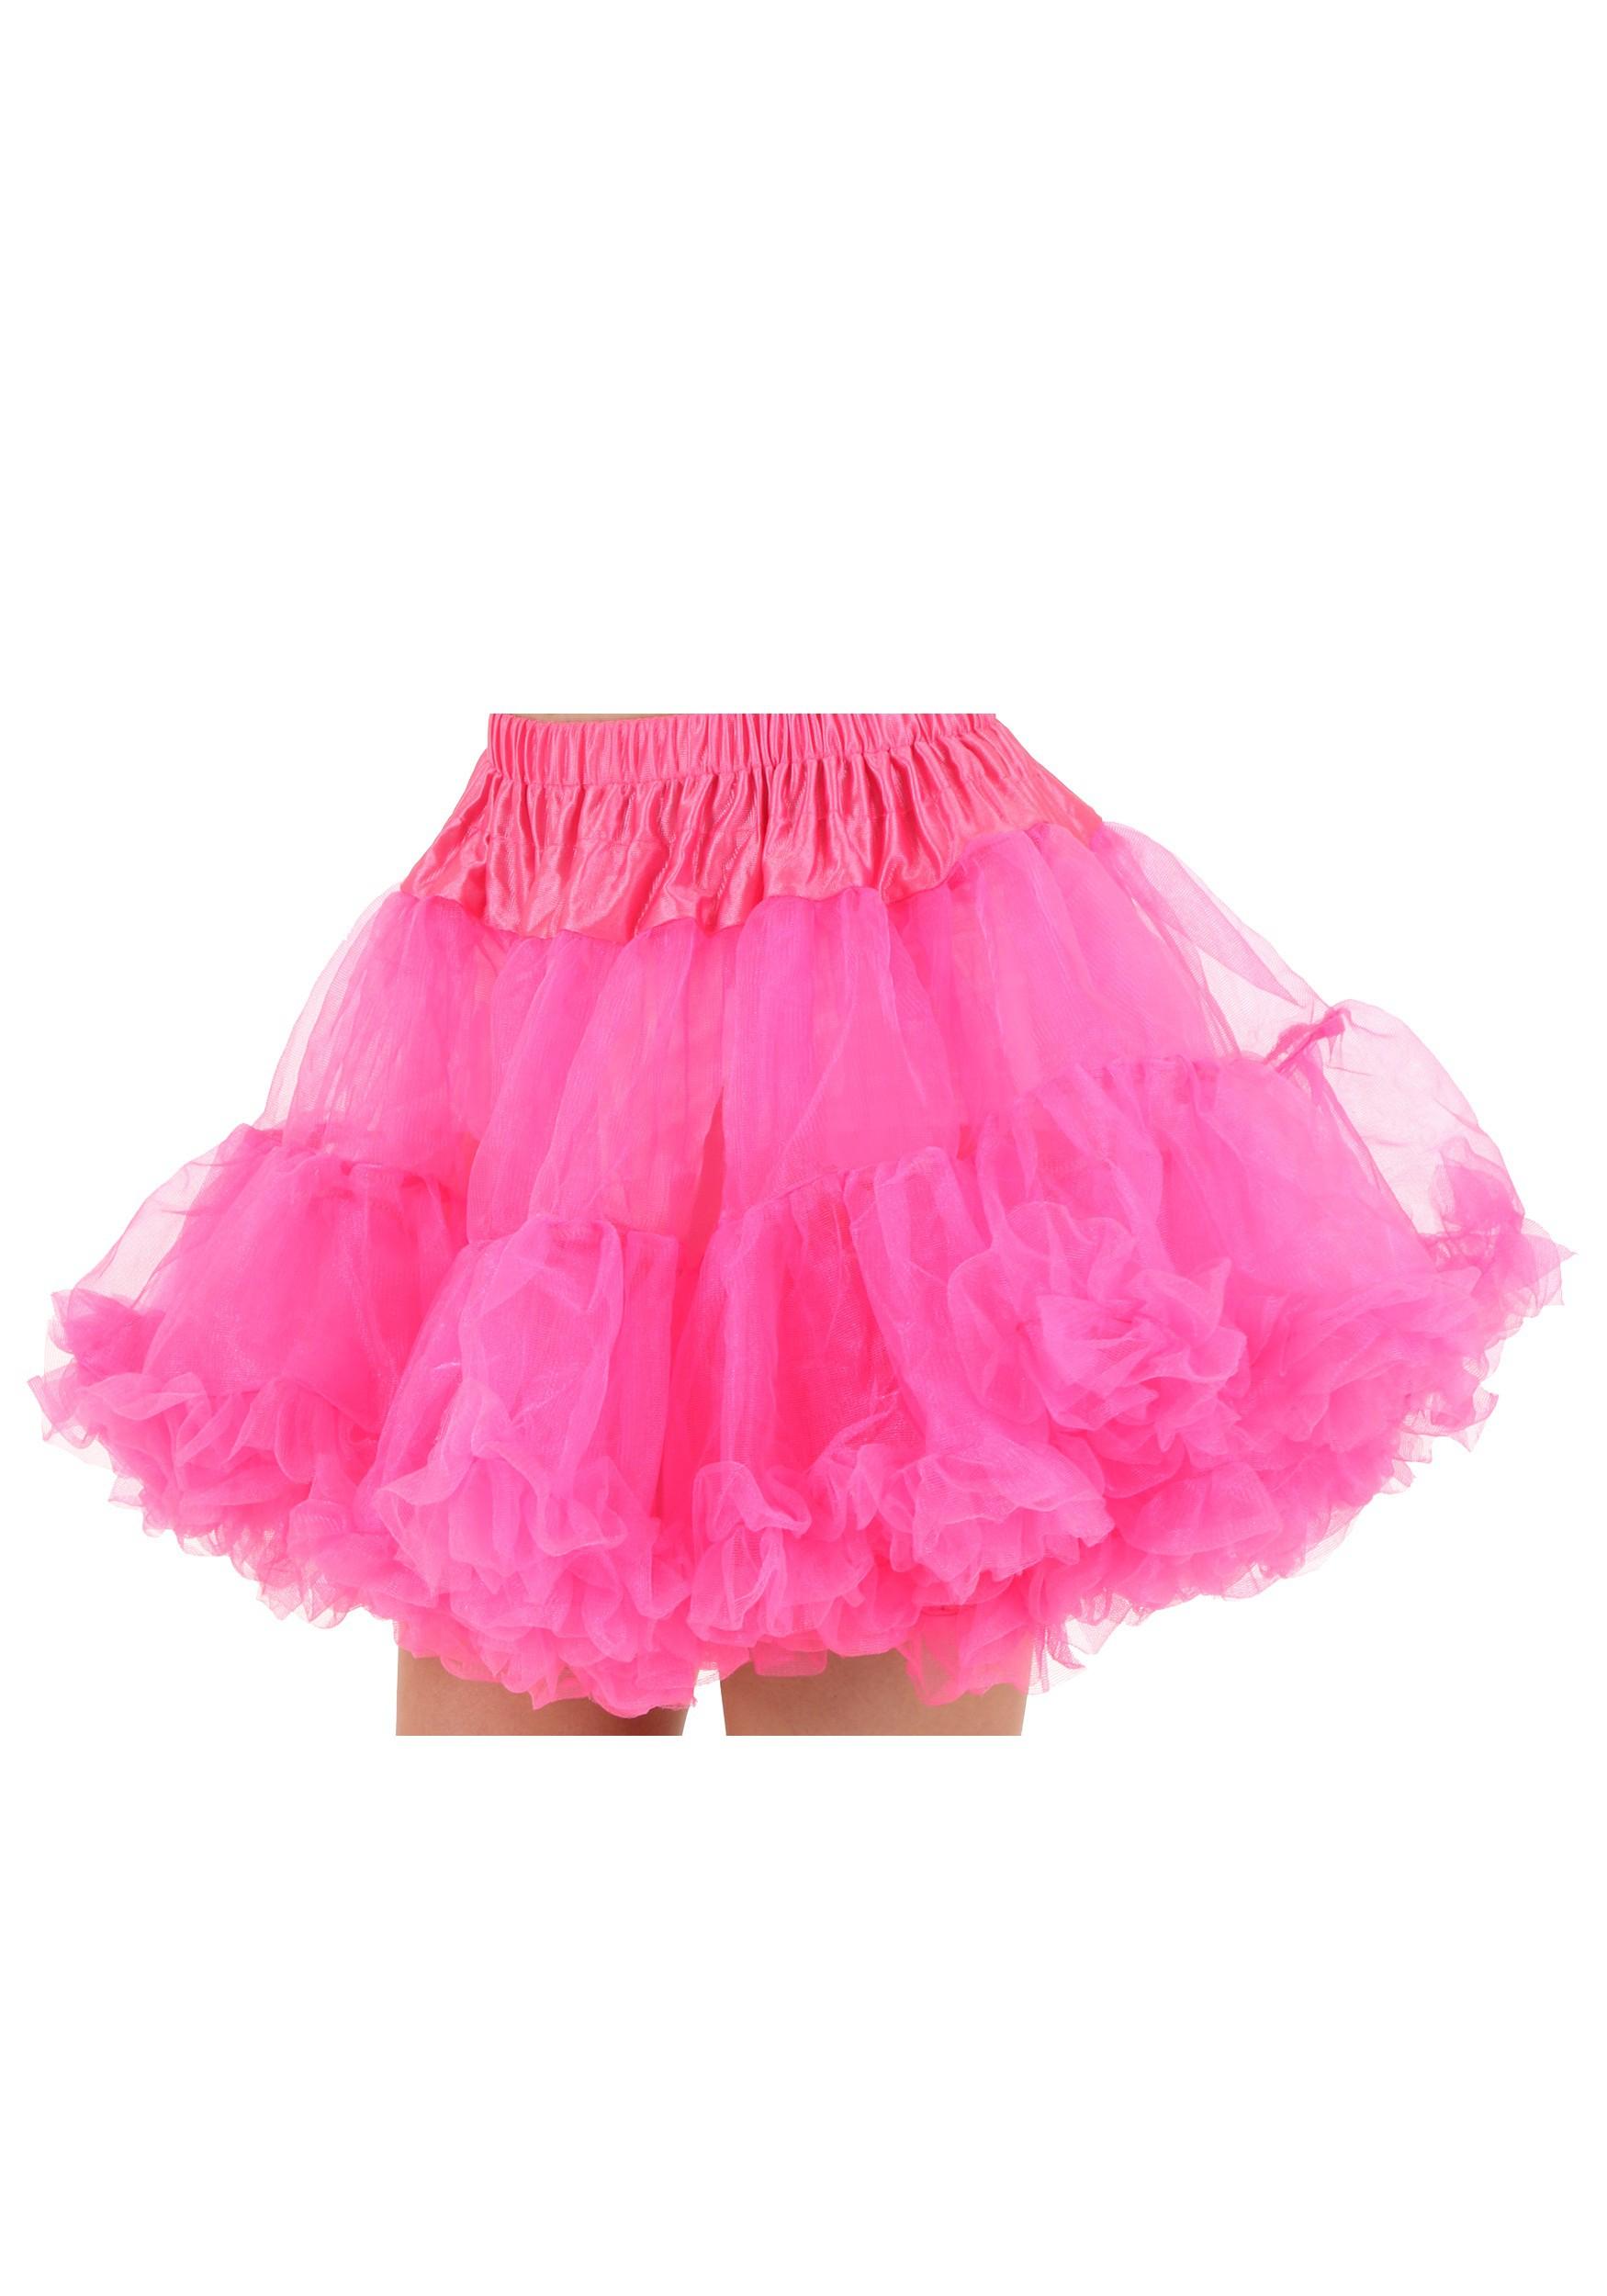 Plus Size Hot Pink Petticoat